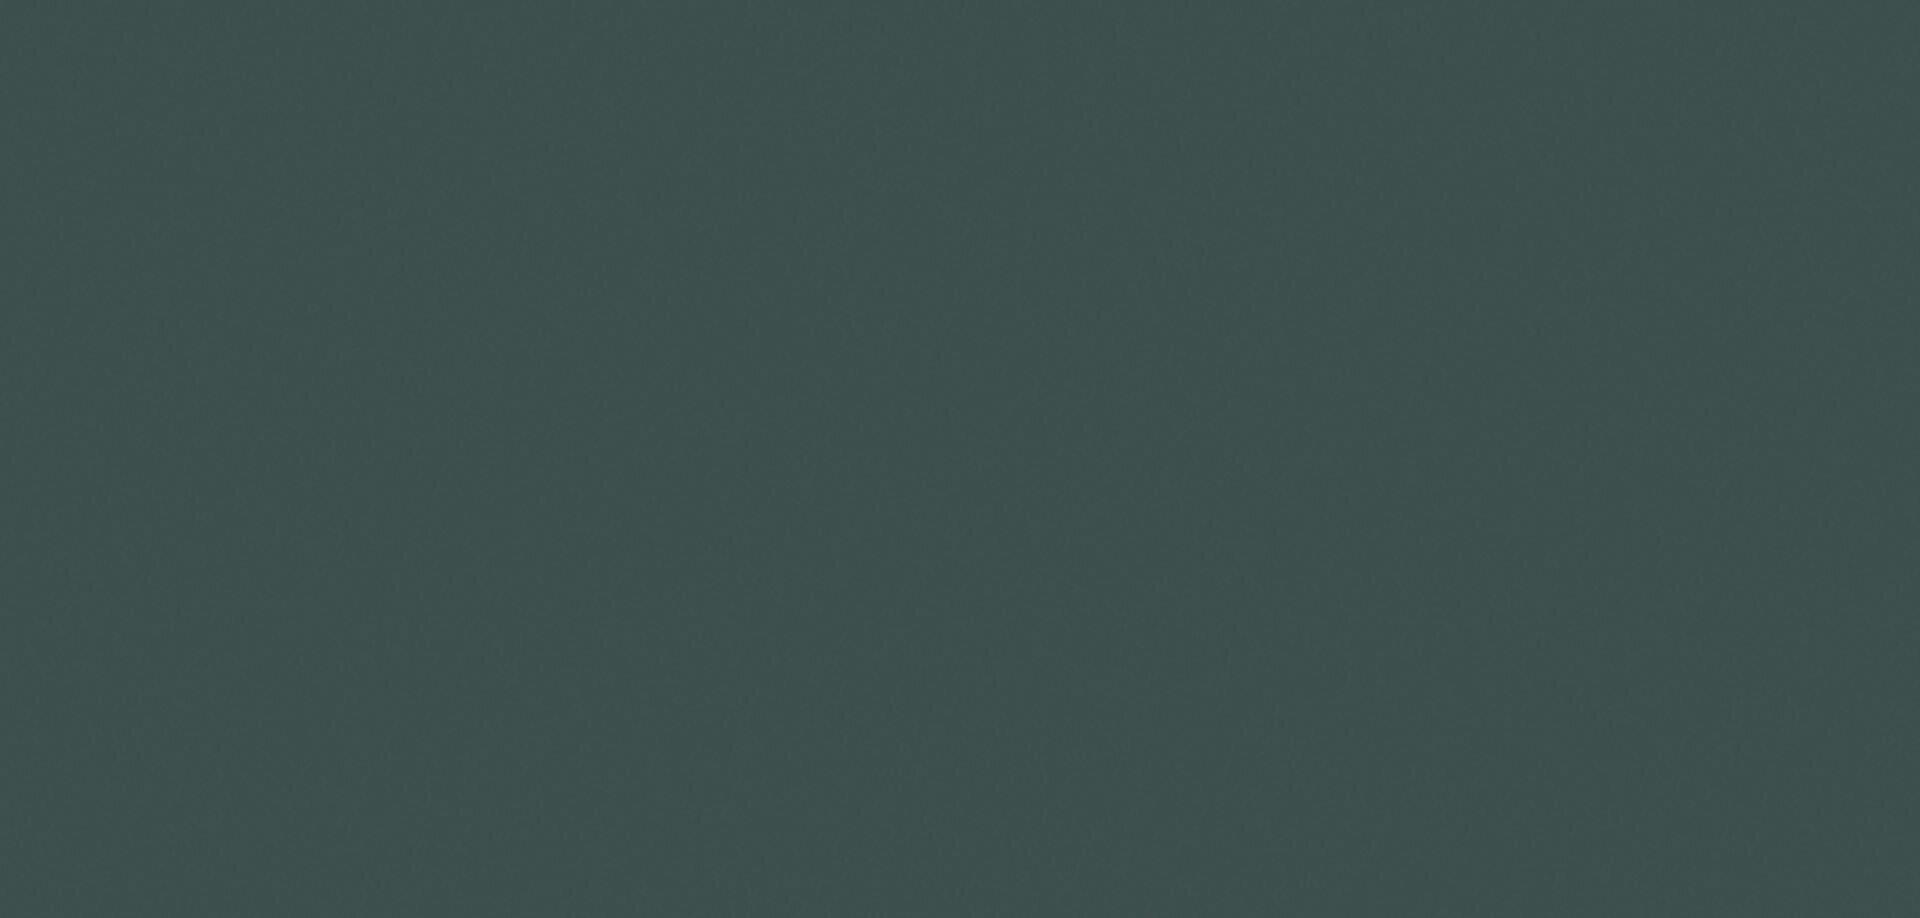 Металлочерепица Дюна 35 ПЭ 0.45 - фото 7024